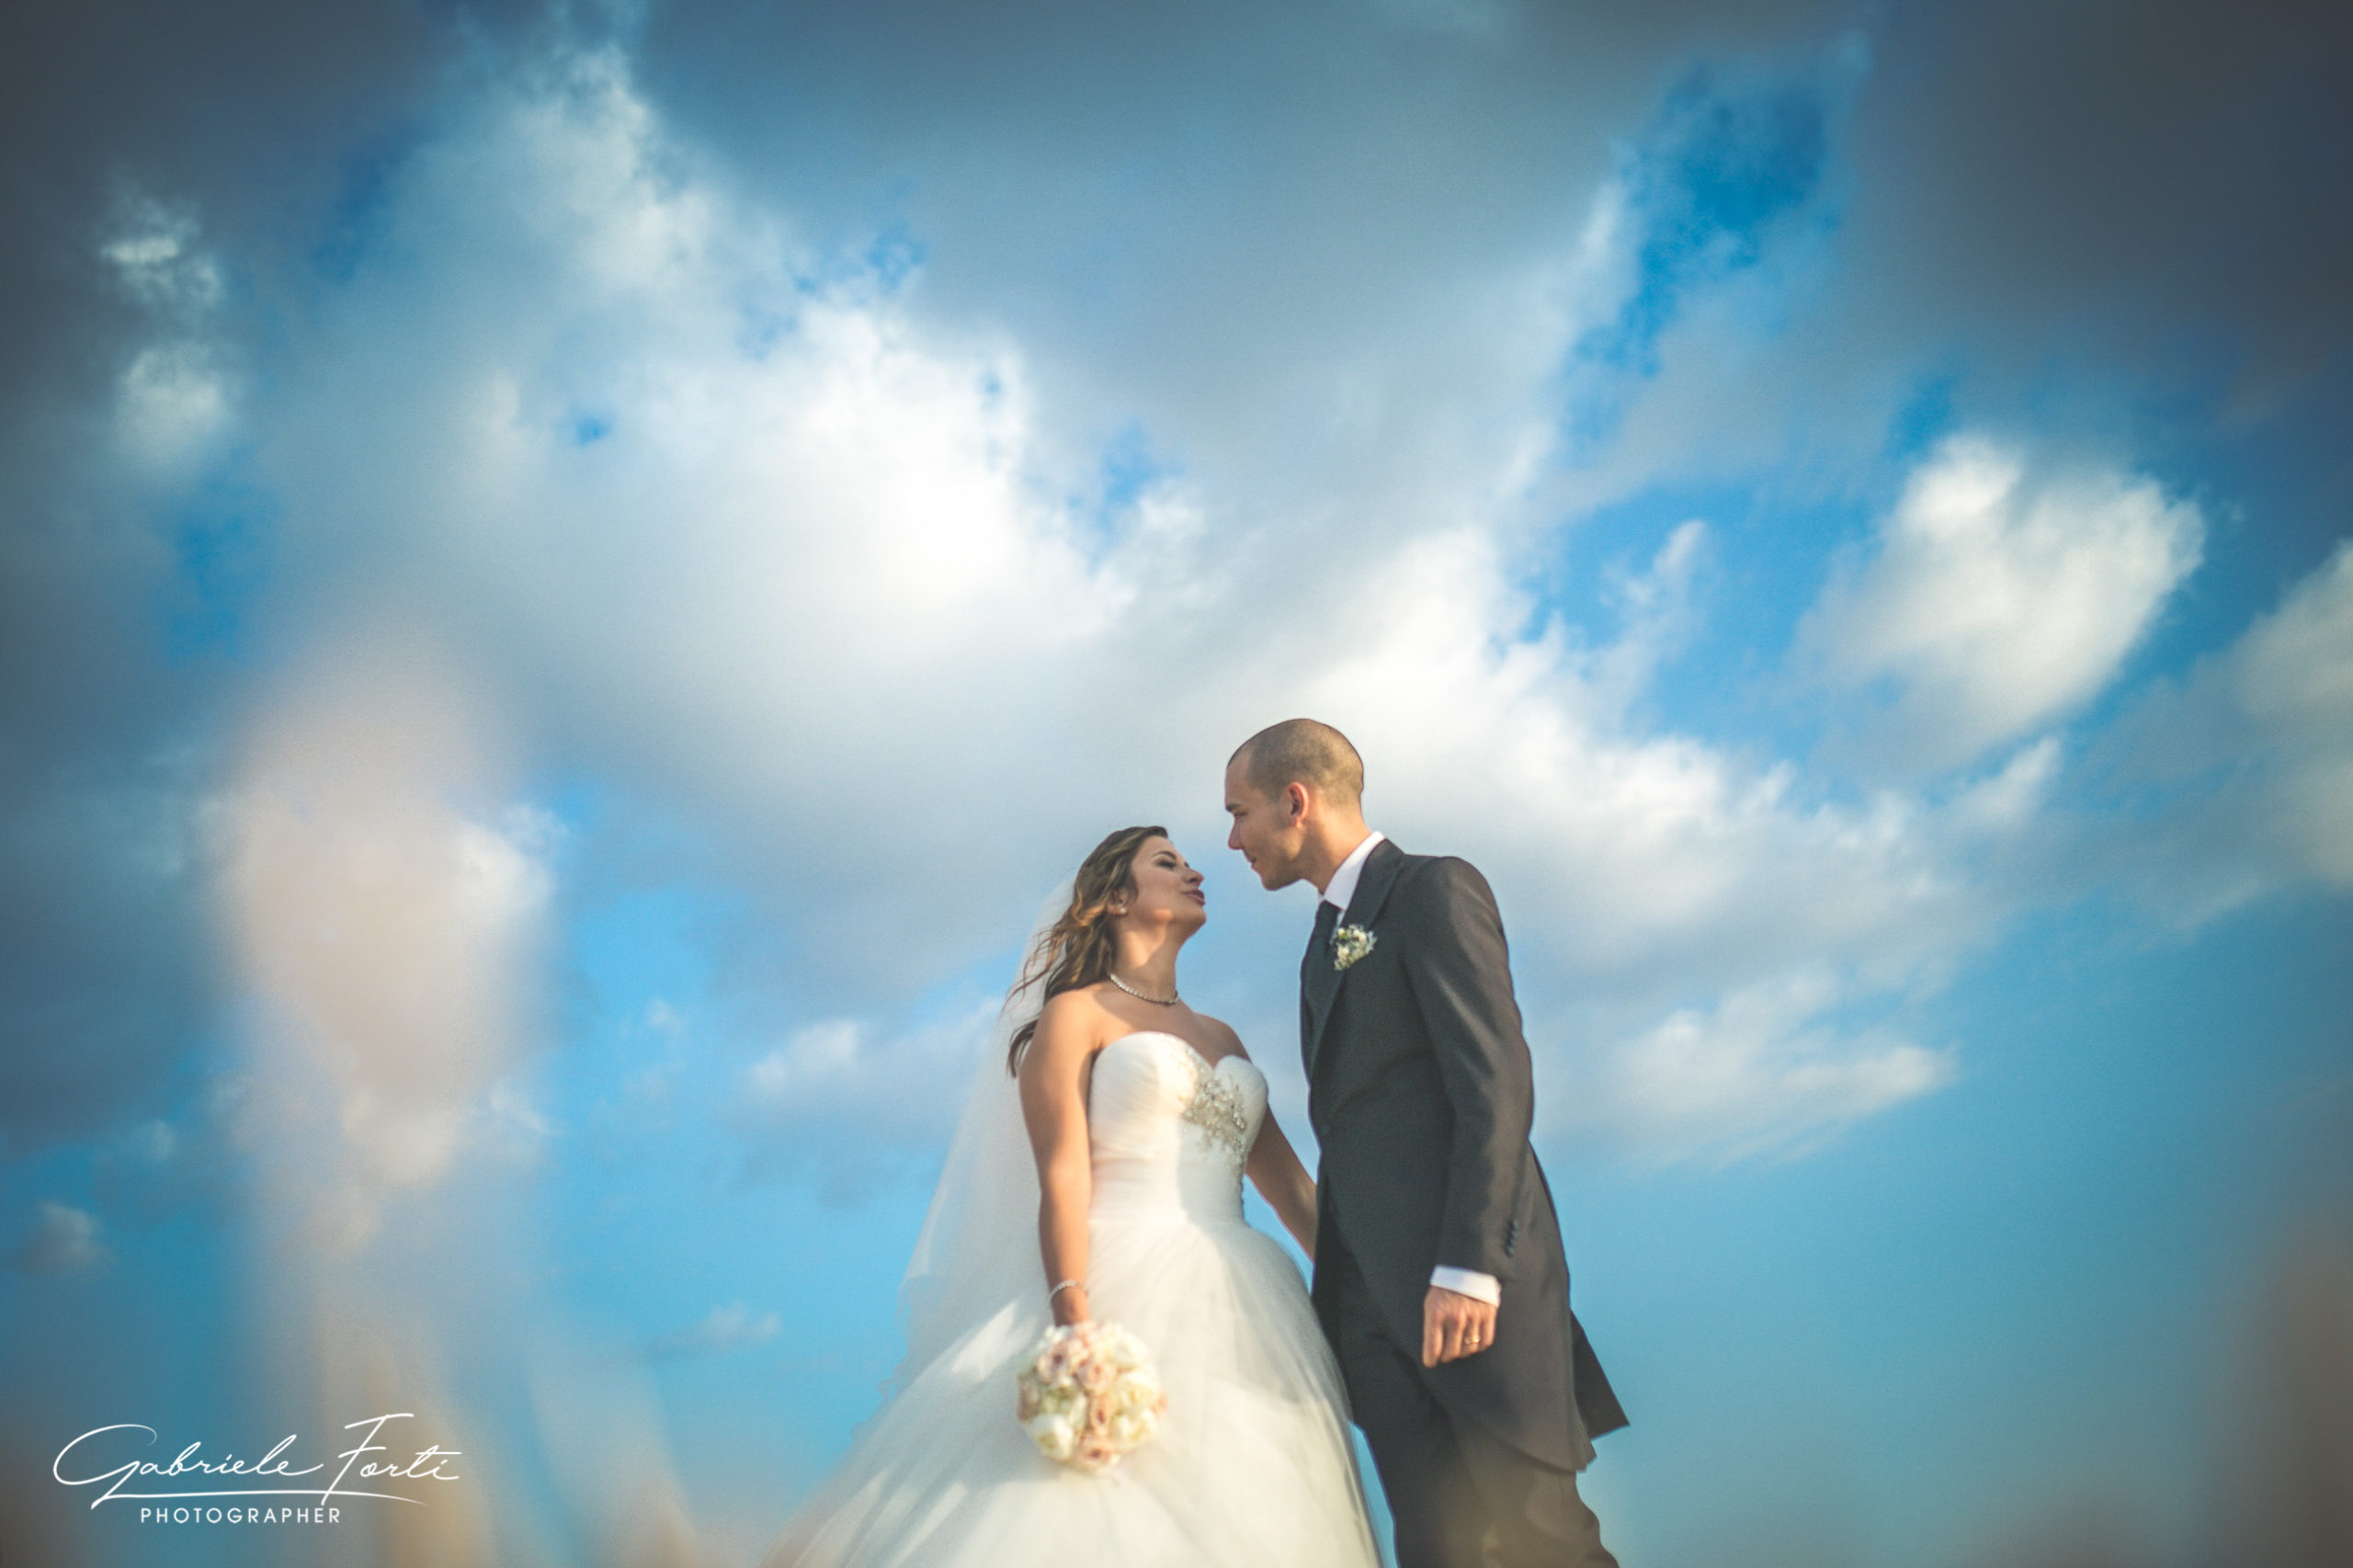 wedding-siena-photographer-reportage-foto-forti-gabriele